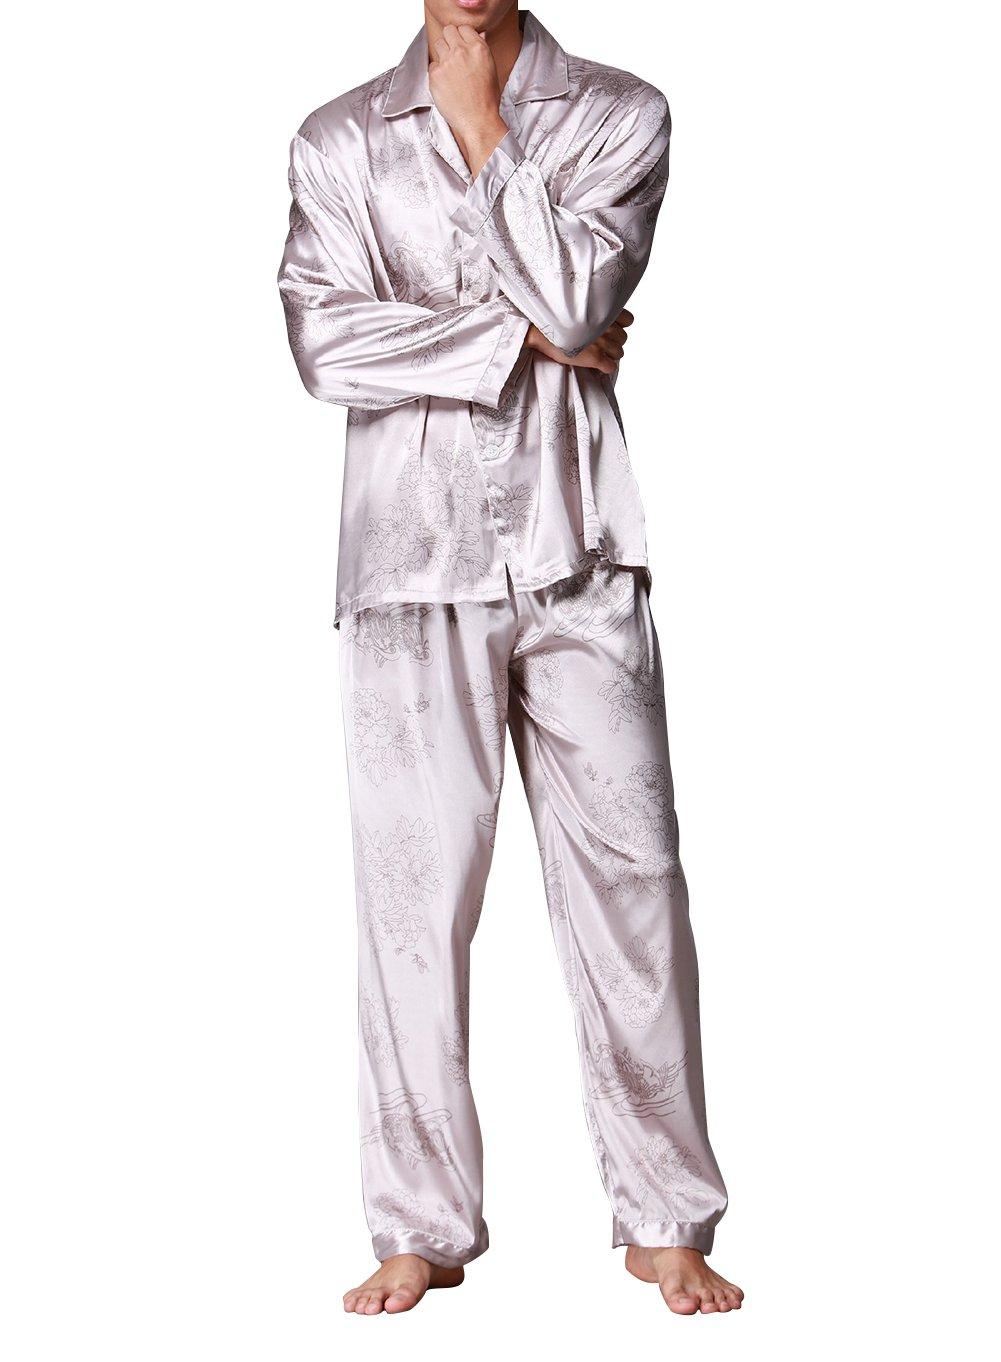 Musen Men's Silk Pajama Sets 2pcs Satin Sleepwear Loungewear Mandarin Duck Grey XL